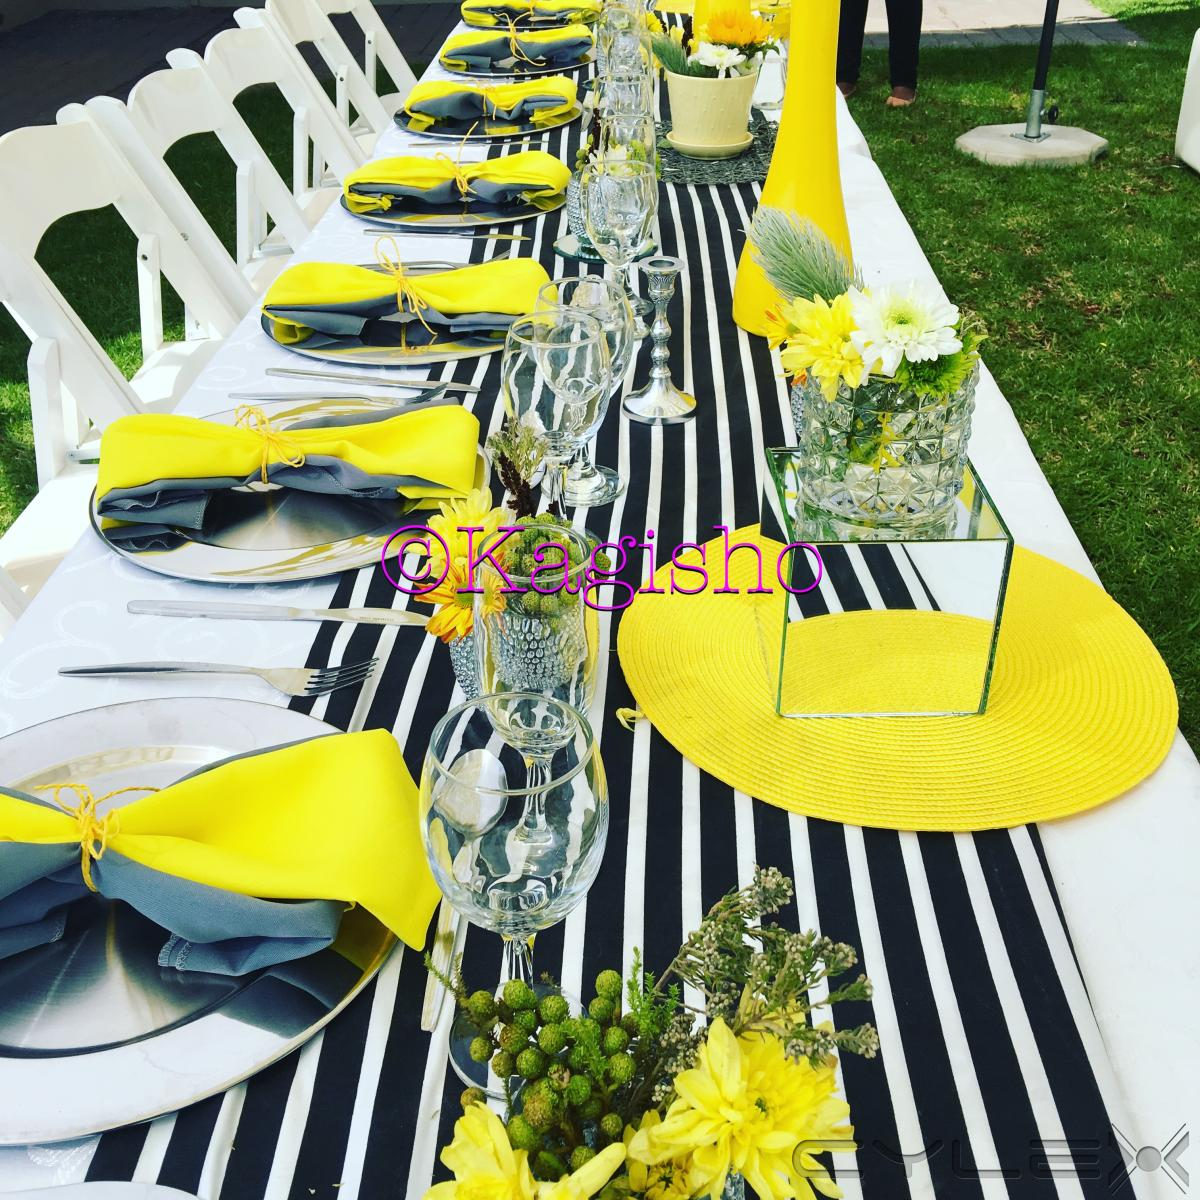 Home Decor Parties Companies: Kagisho Catering, Centurion